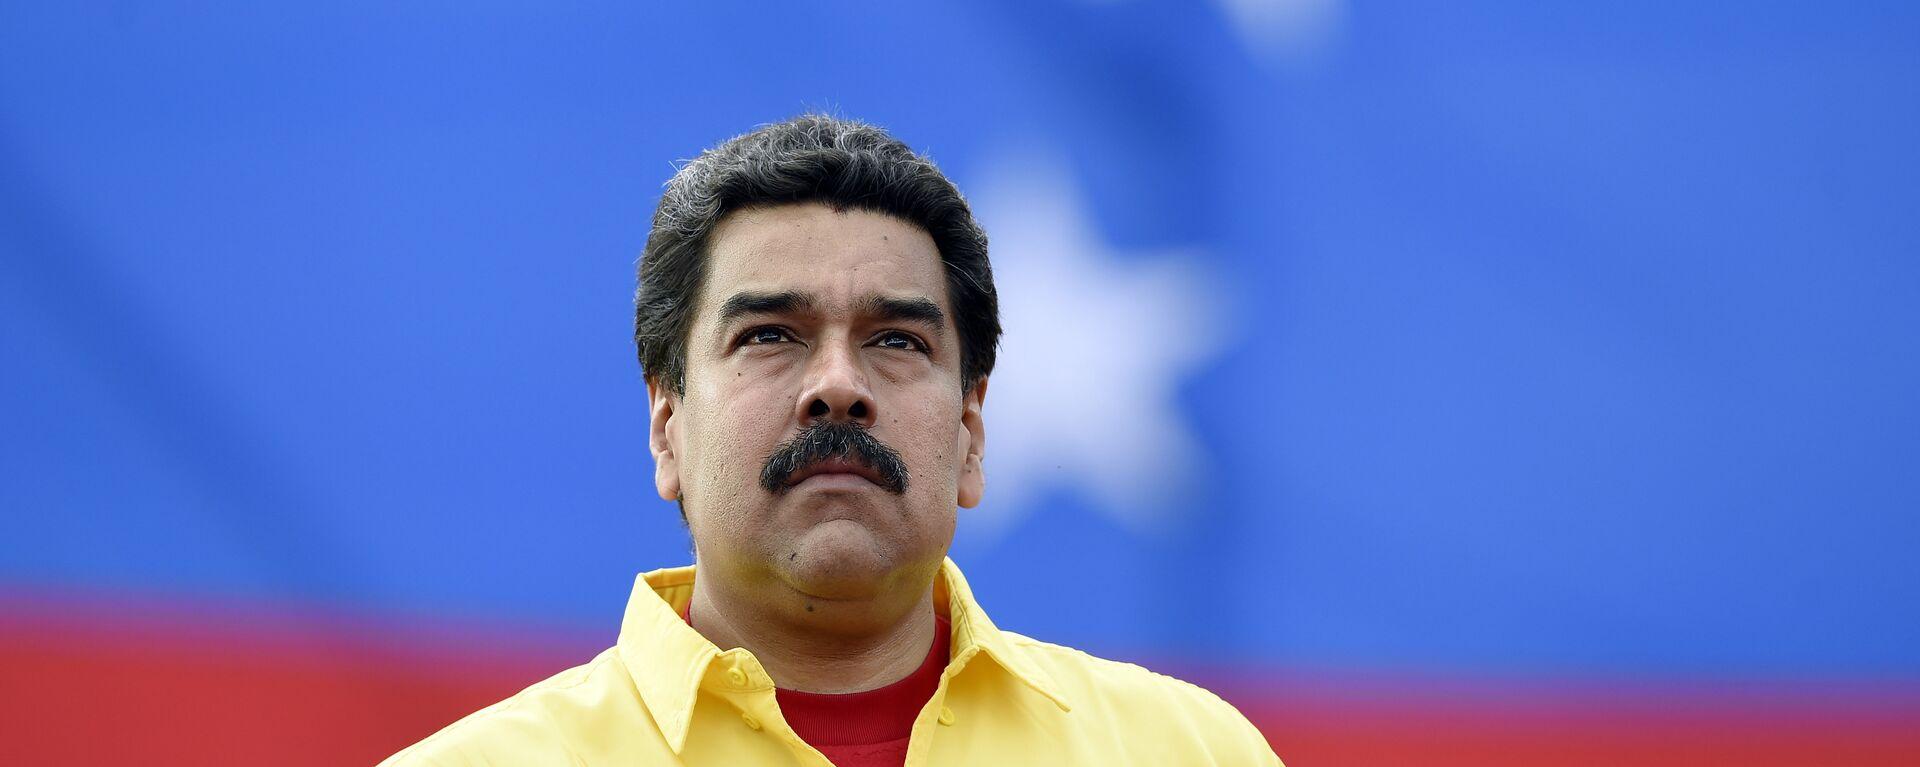 Venezuelan President Nicolas Maduro - Sputnik Mundo, 1920, 04.04.2021